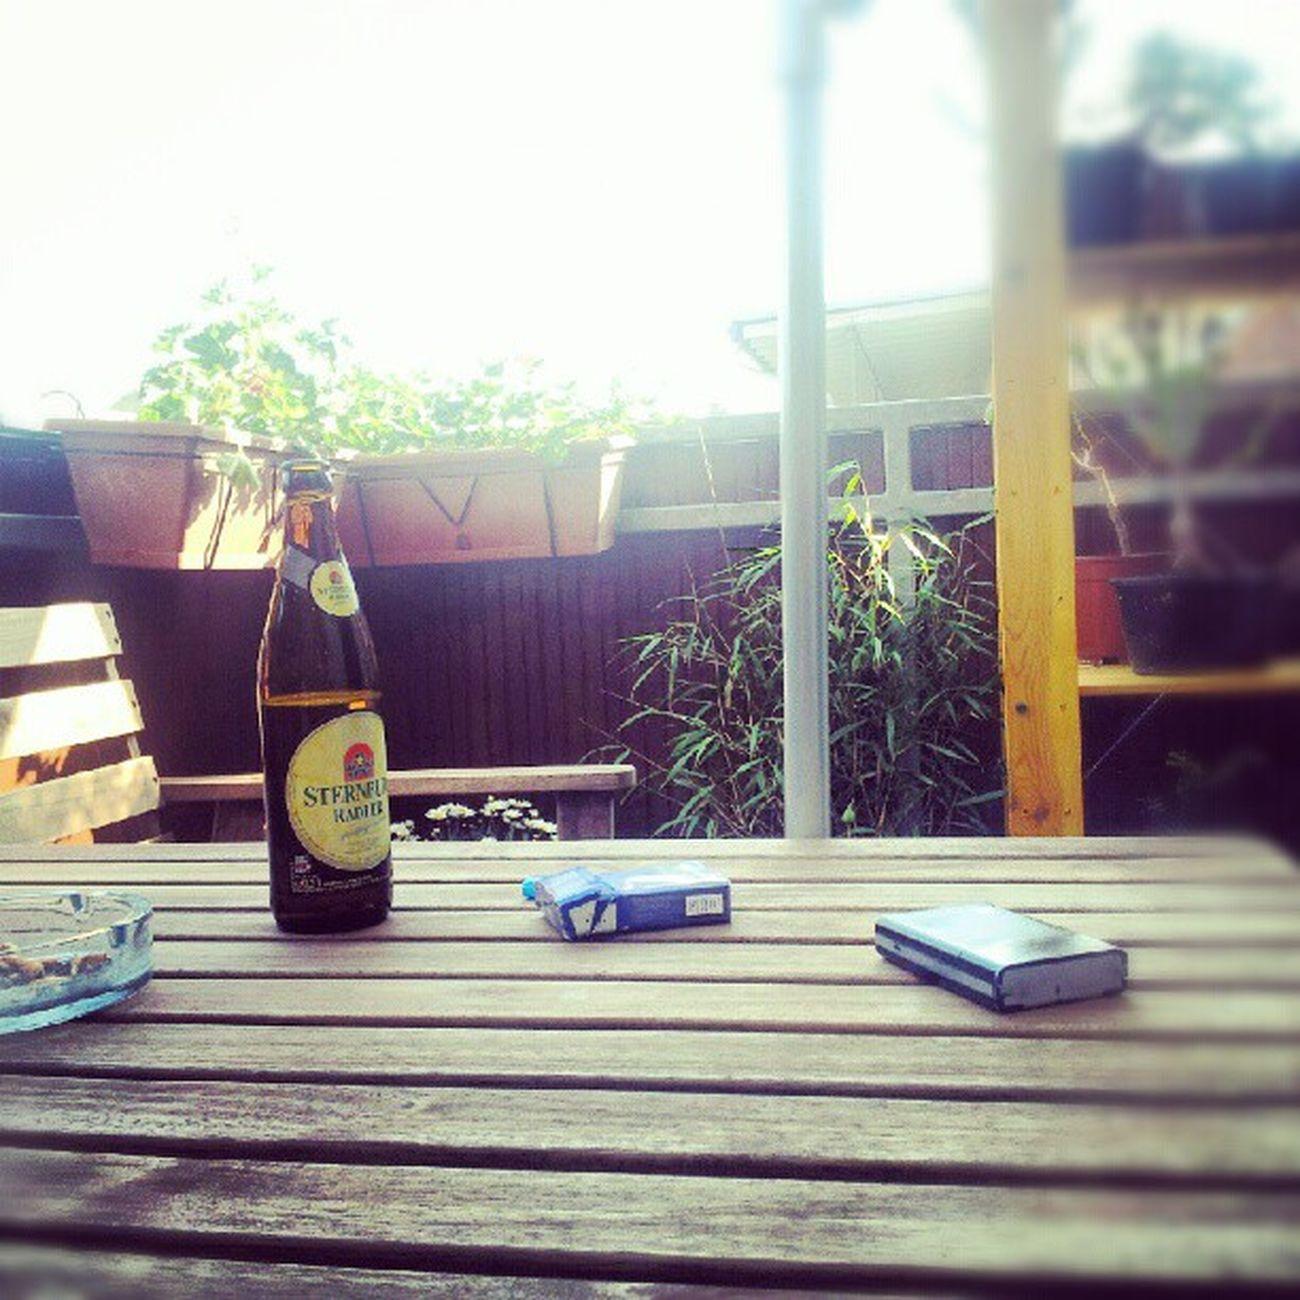 #sommer auf dem #balkon mit kaltem #sterni #radler und #kippen Sterni Radler 10likes Sonntagsaufgabe Balkon Faulseinistwunderbar Kippen Sommer